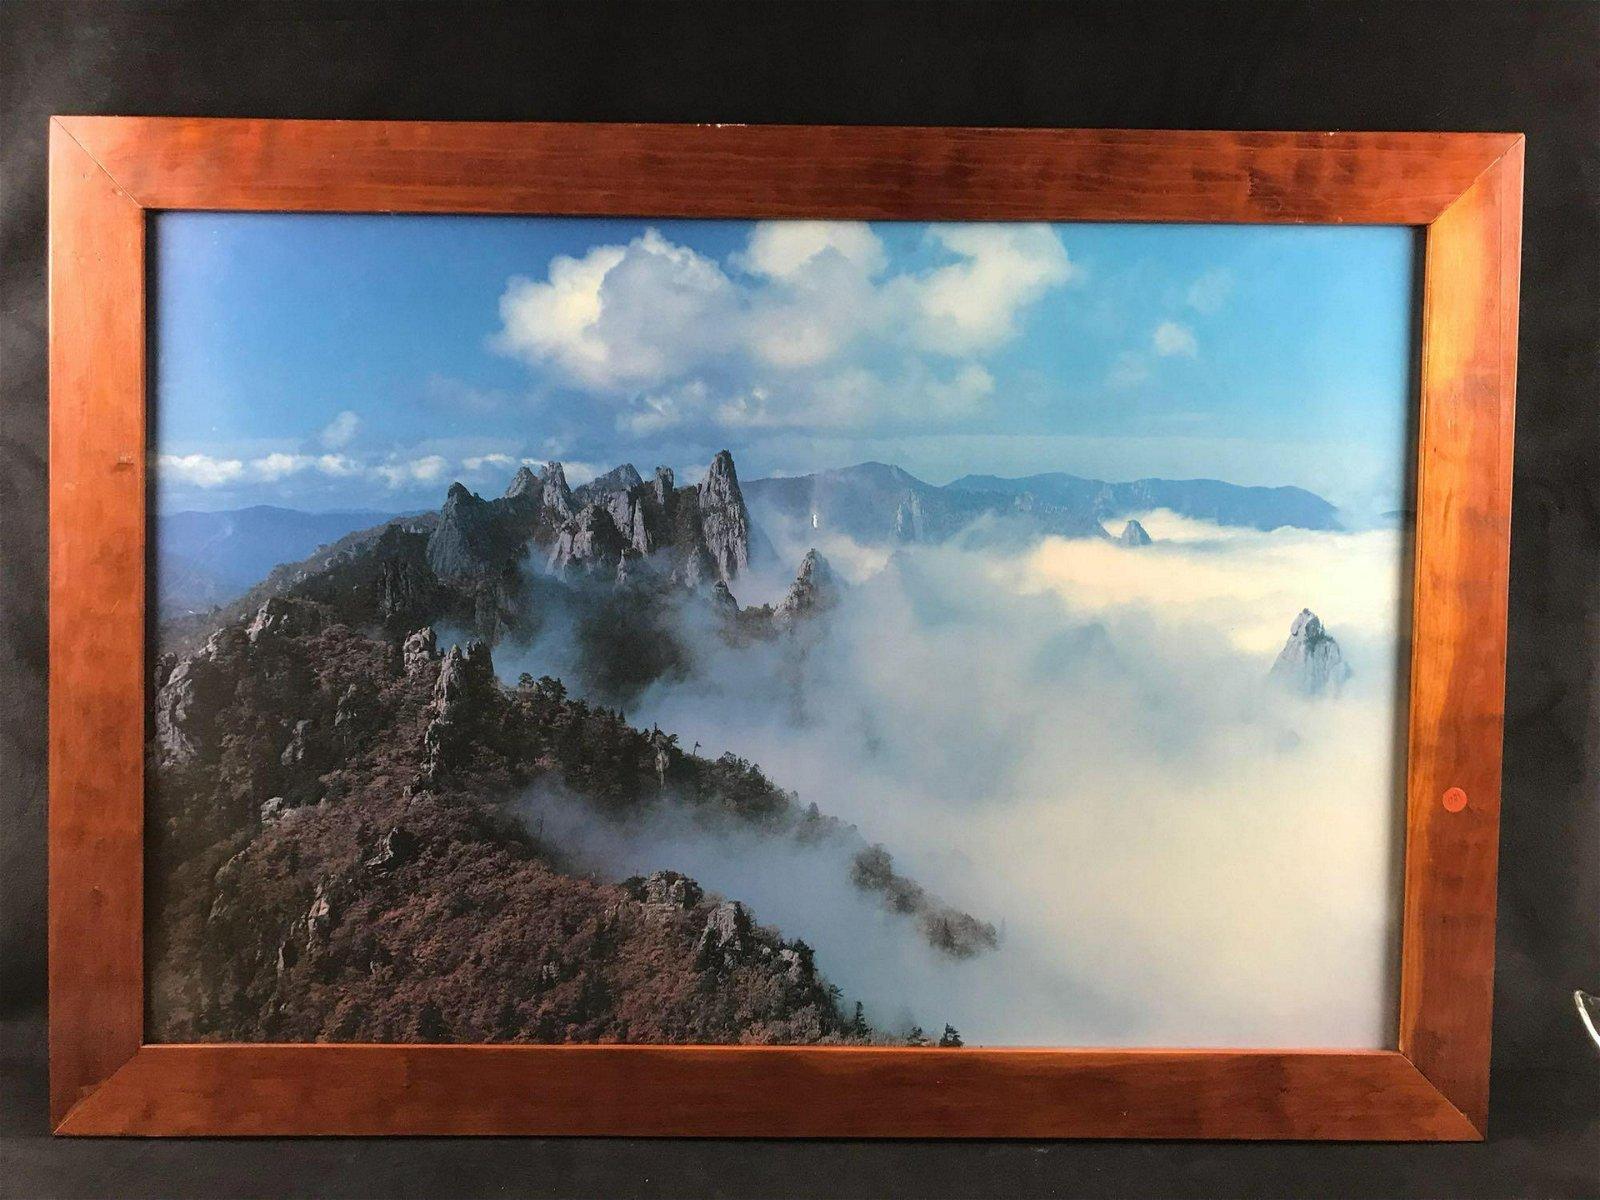 Ben Franklin Crafts Framed Mountain Photograph Print